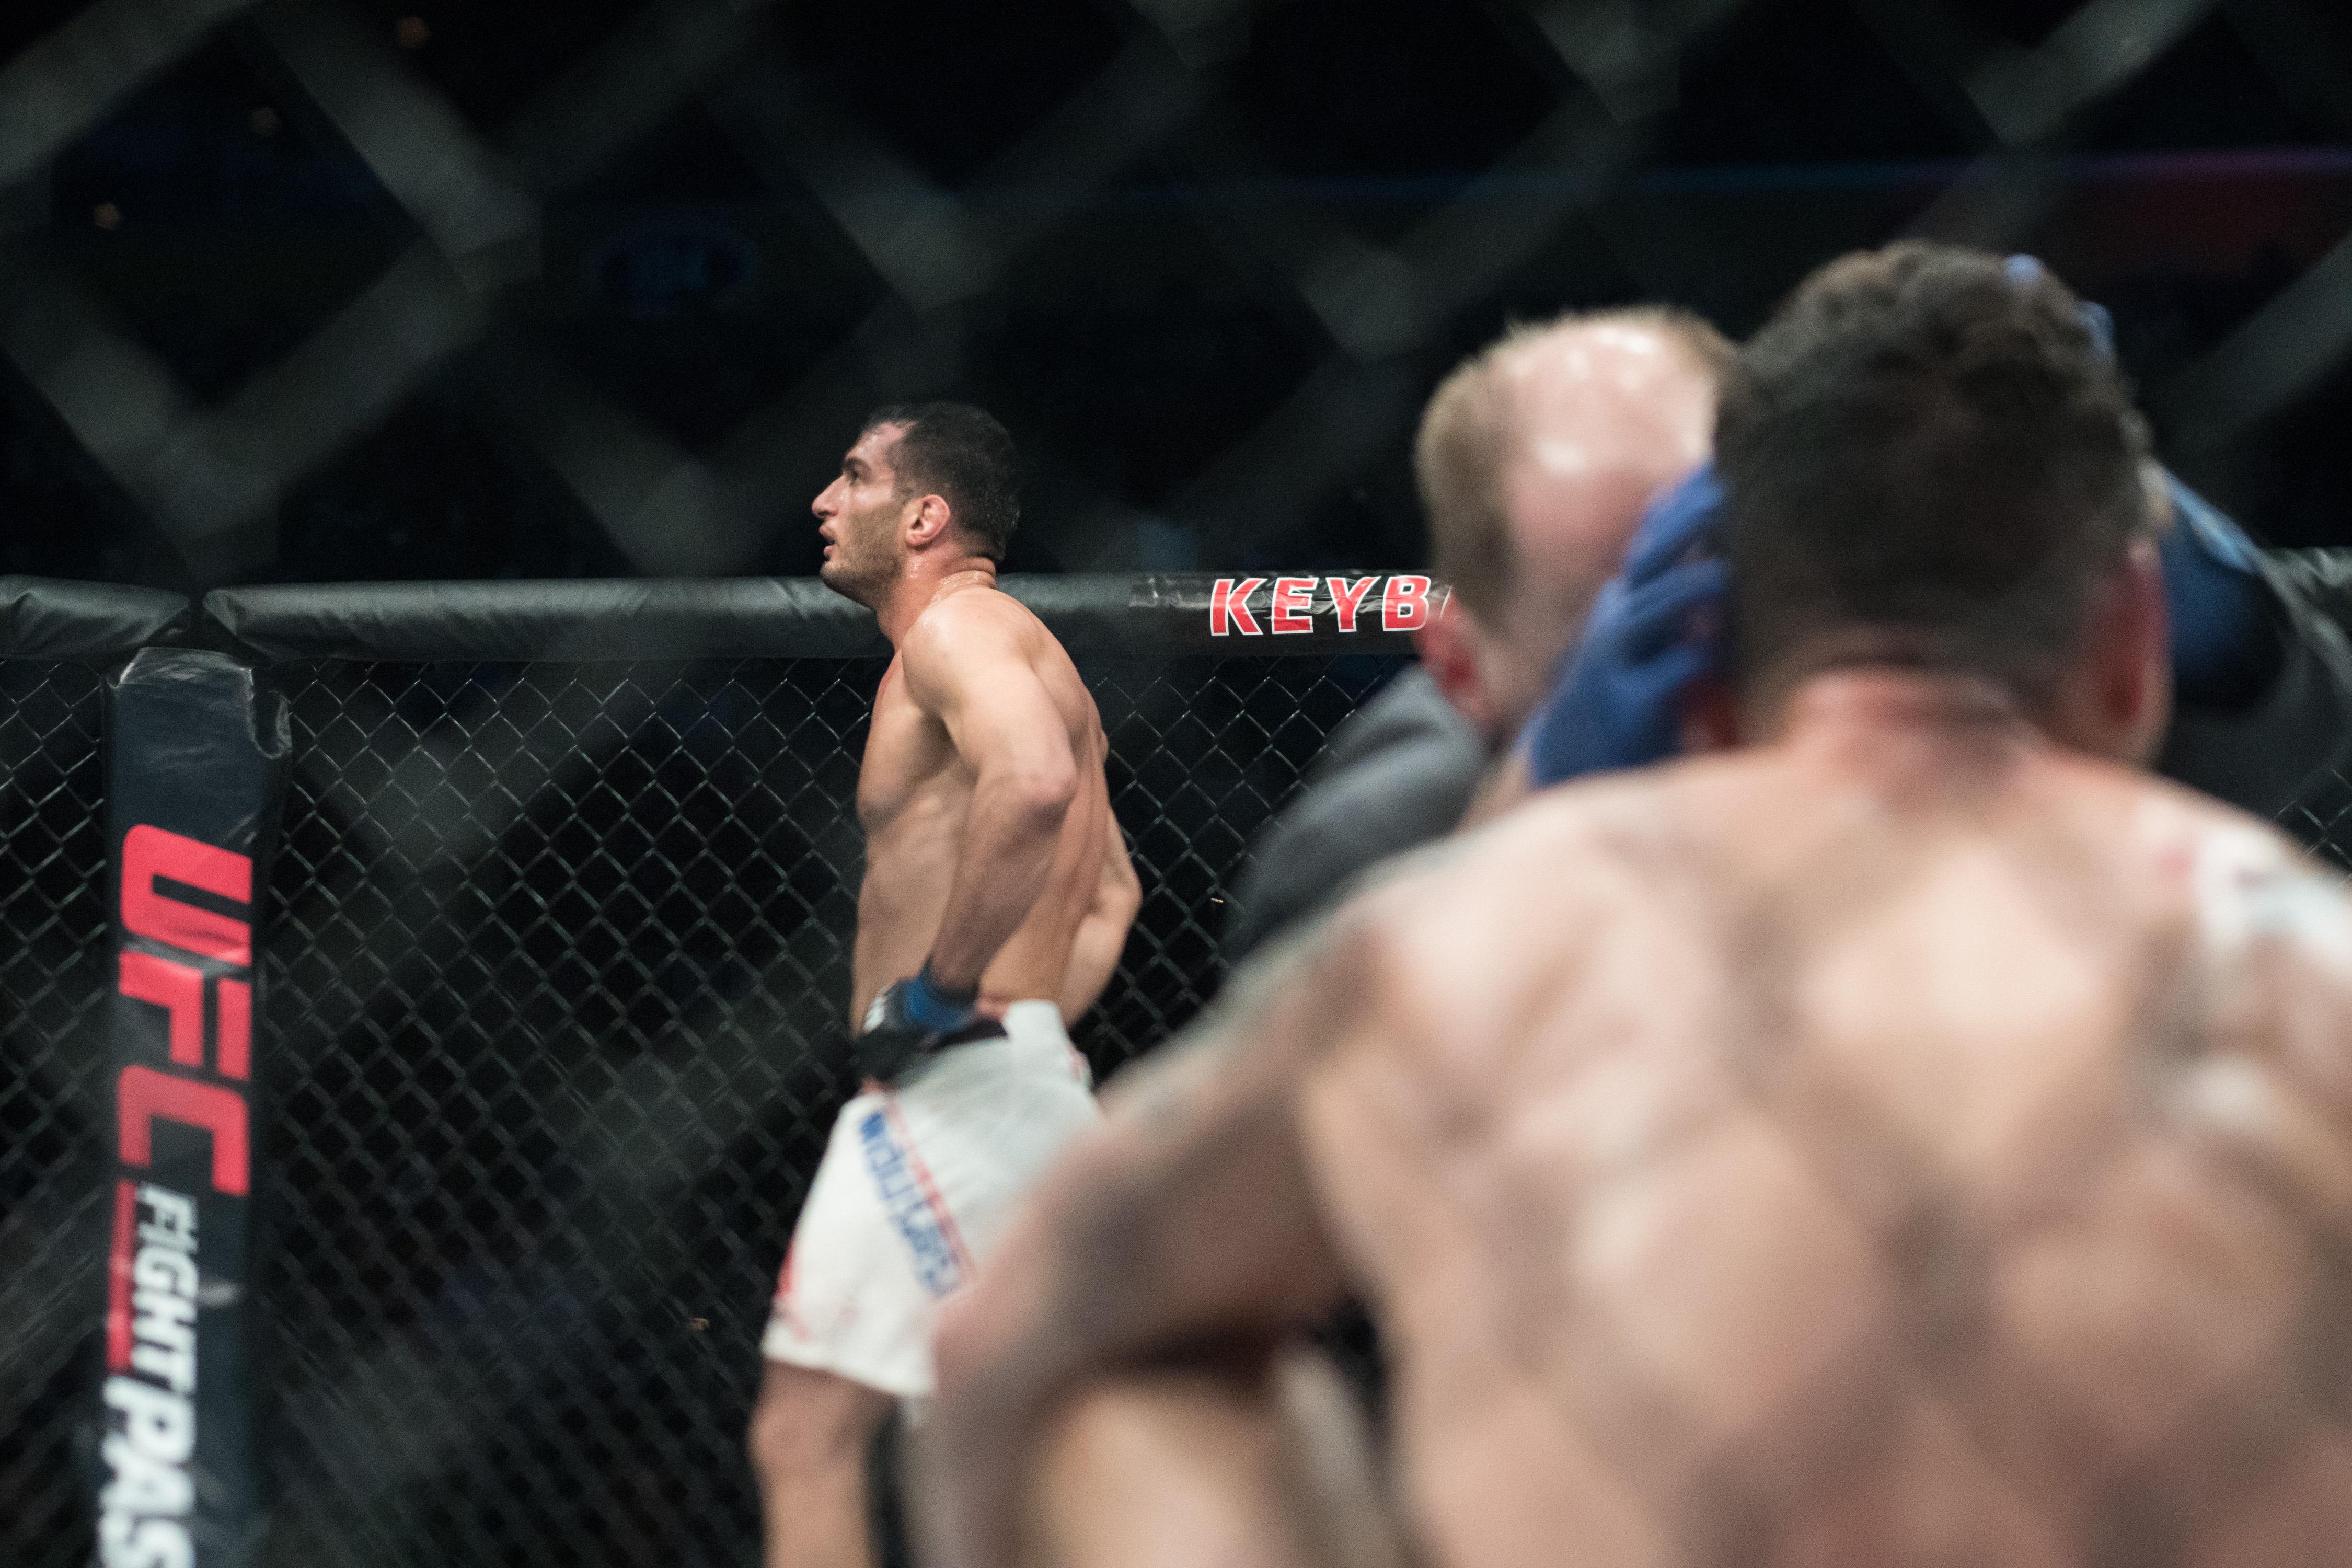 Gegard Mousasi paces in the Octagon after defeating Chris Weidman via TKO at UFC 210.